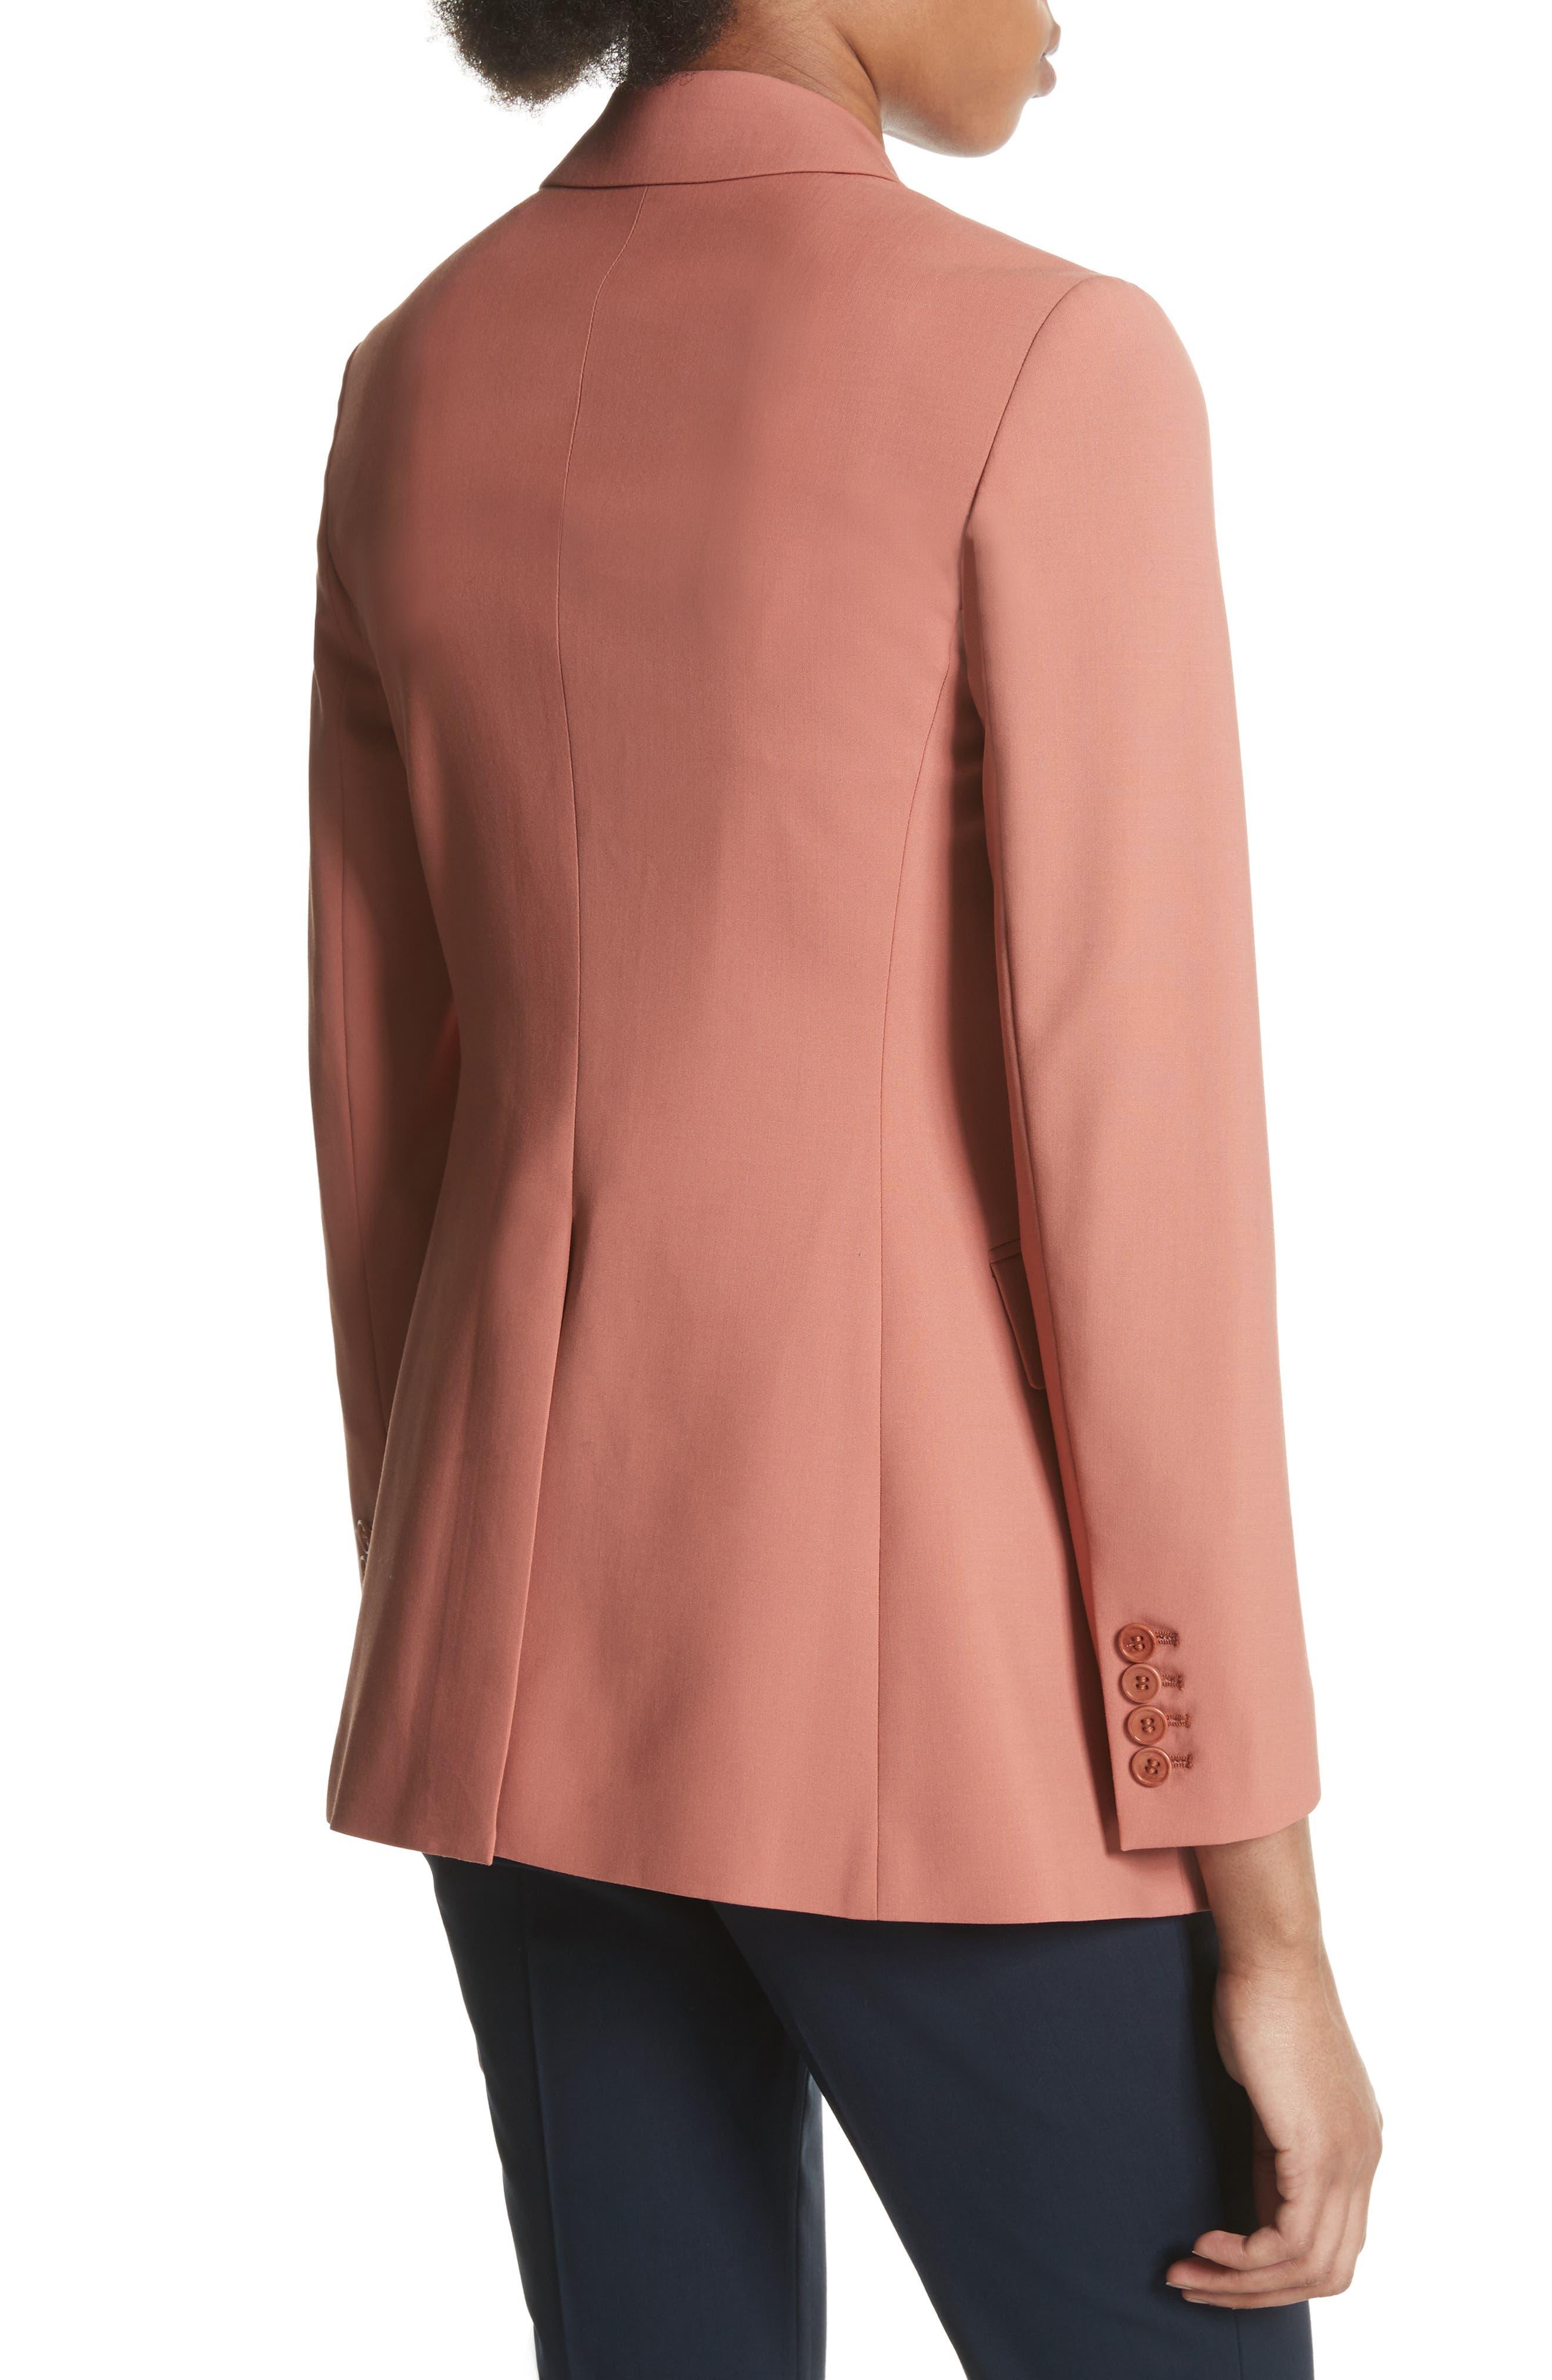 Etienette B Good Wool Suit Jacket,                             Alternate thumbnail 12, color,